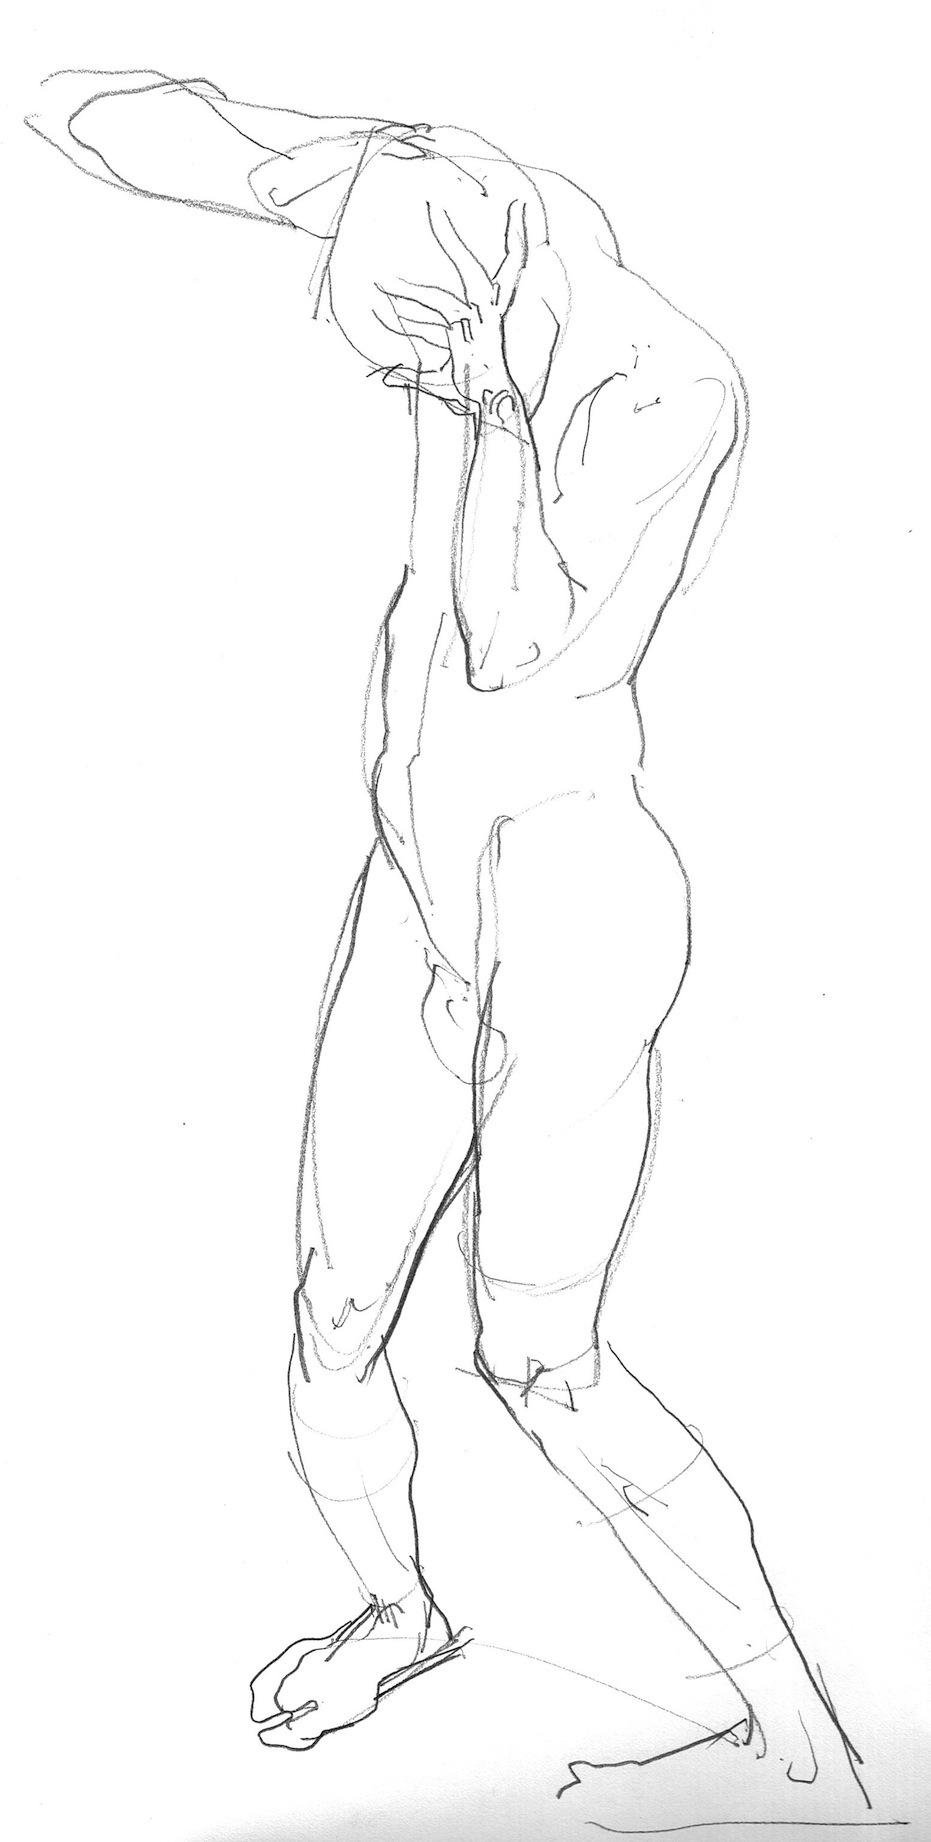 scott breton pencil 2 1.jpeg